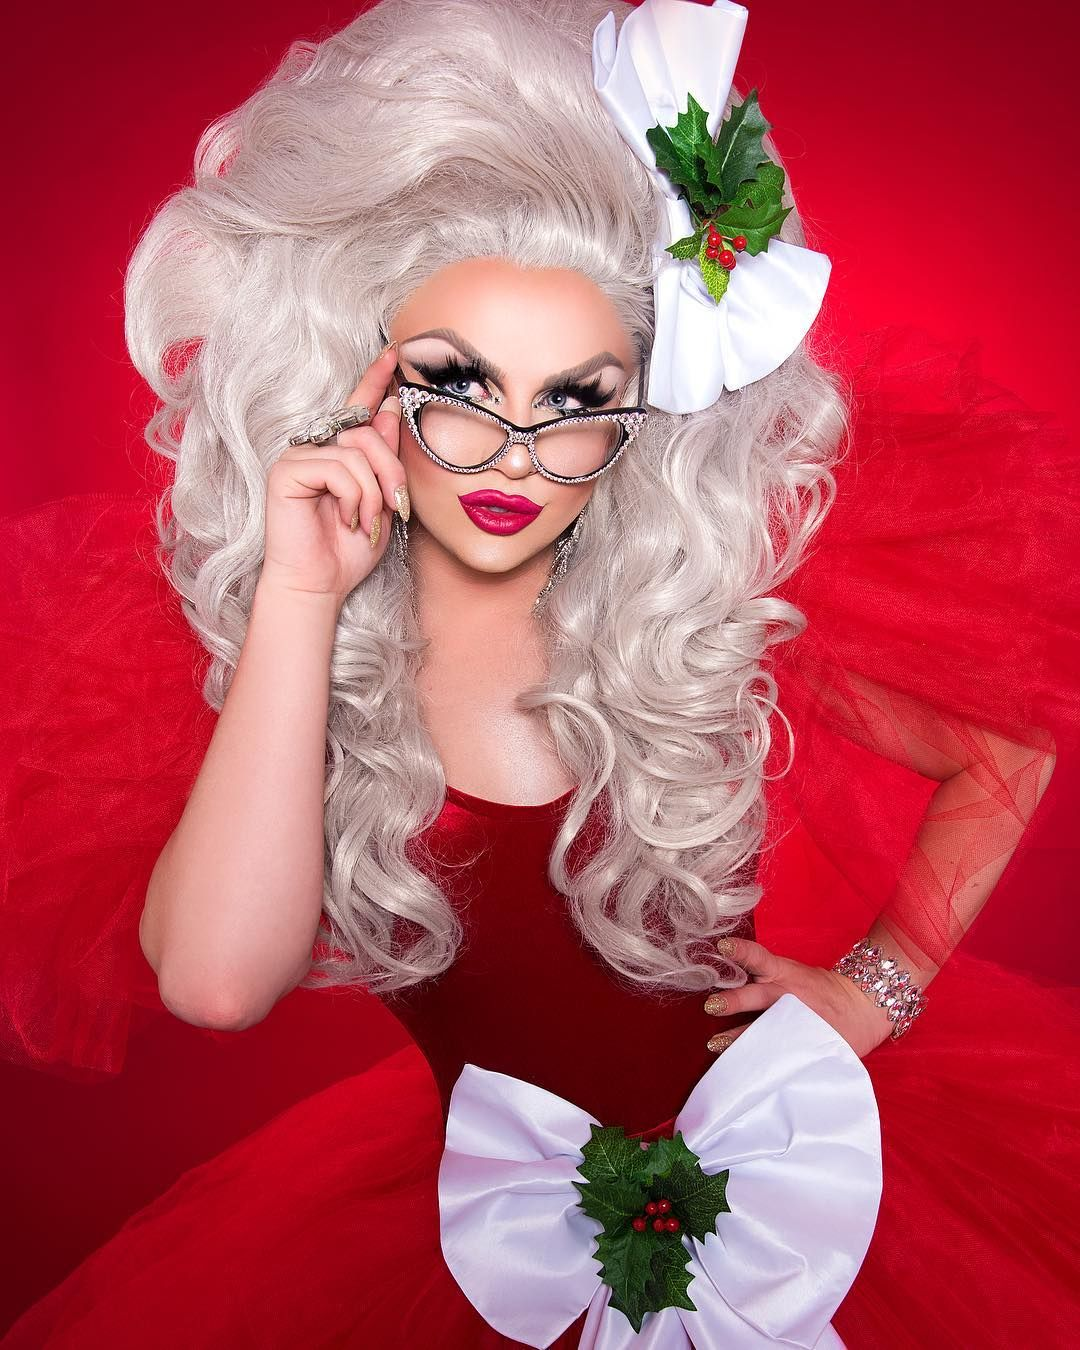 Christmas Queens Tour 2019 Pin by Rado Valef on DRAG EXTRAVAGANZA in 2019   Drag queen